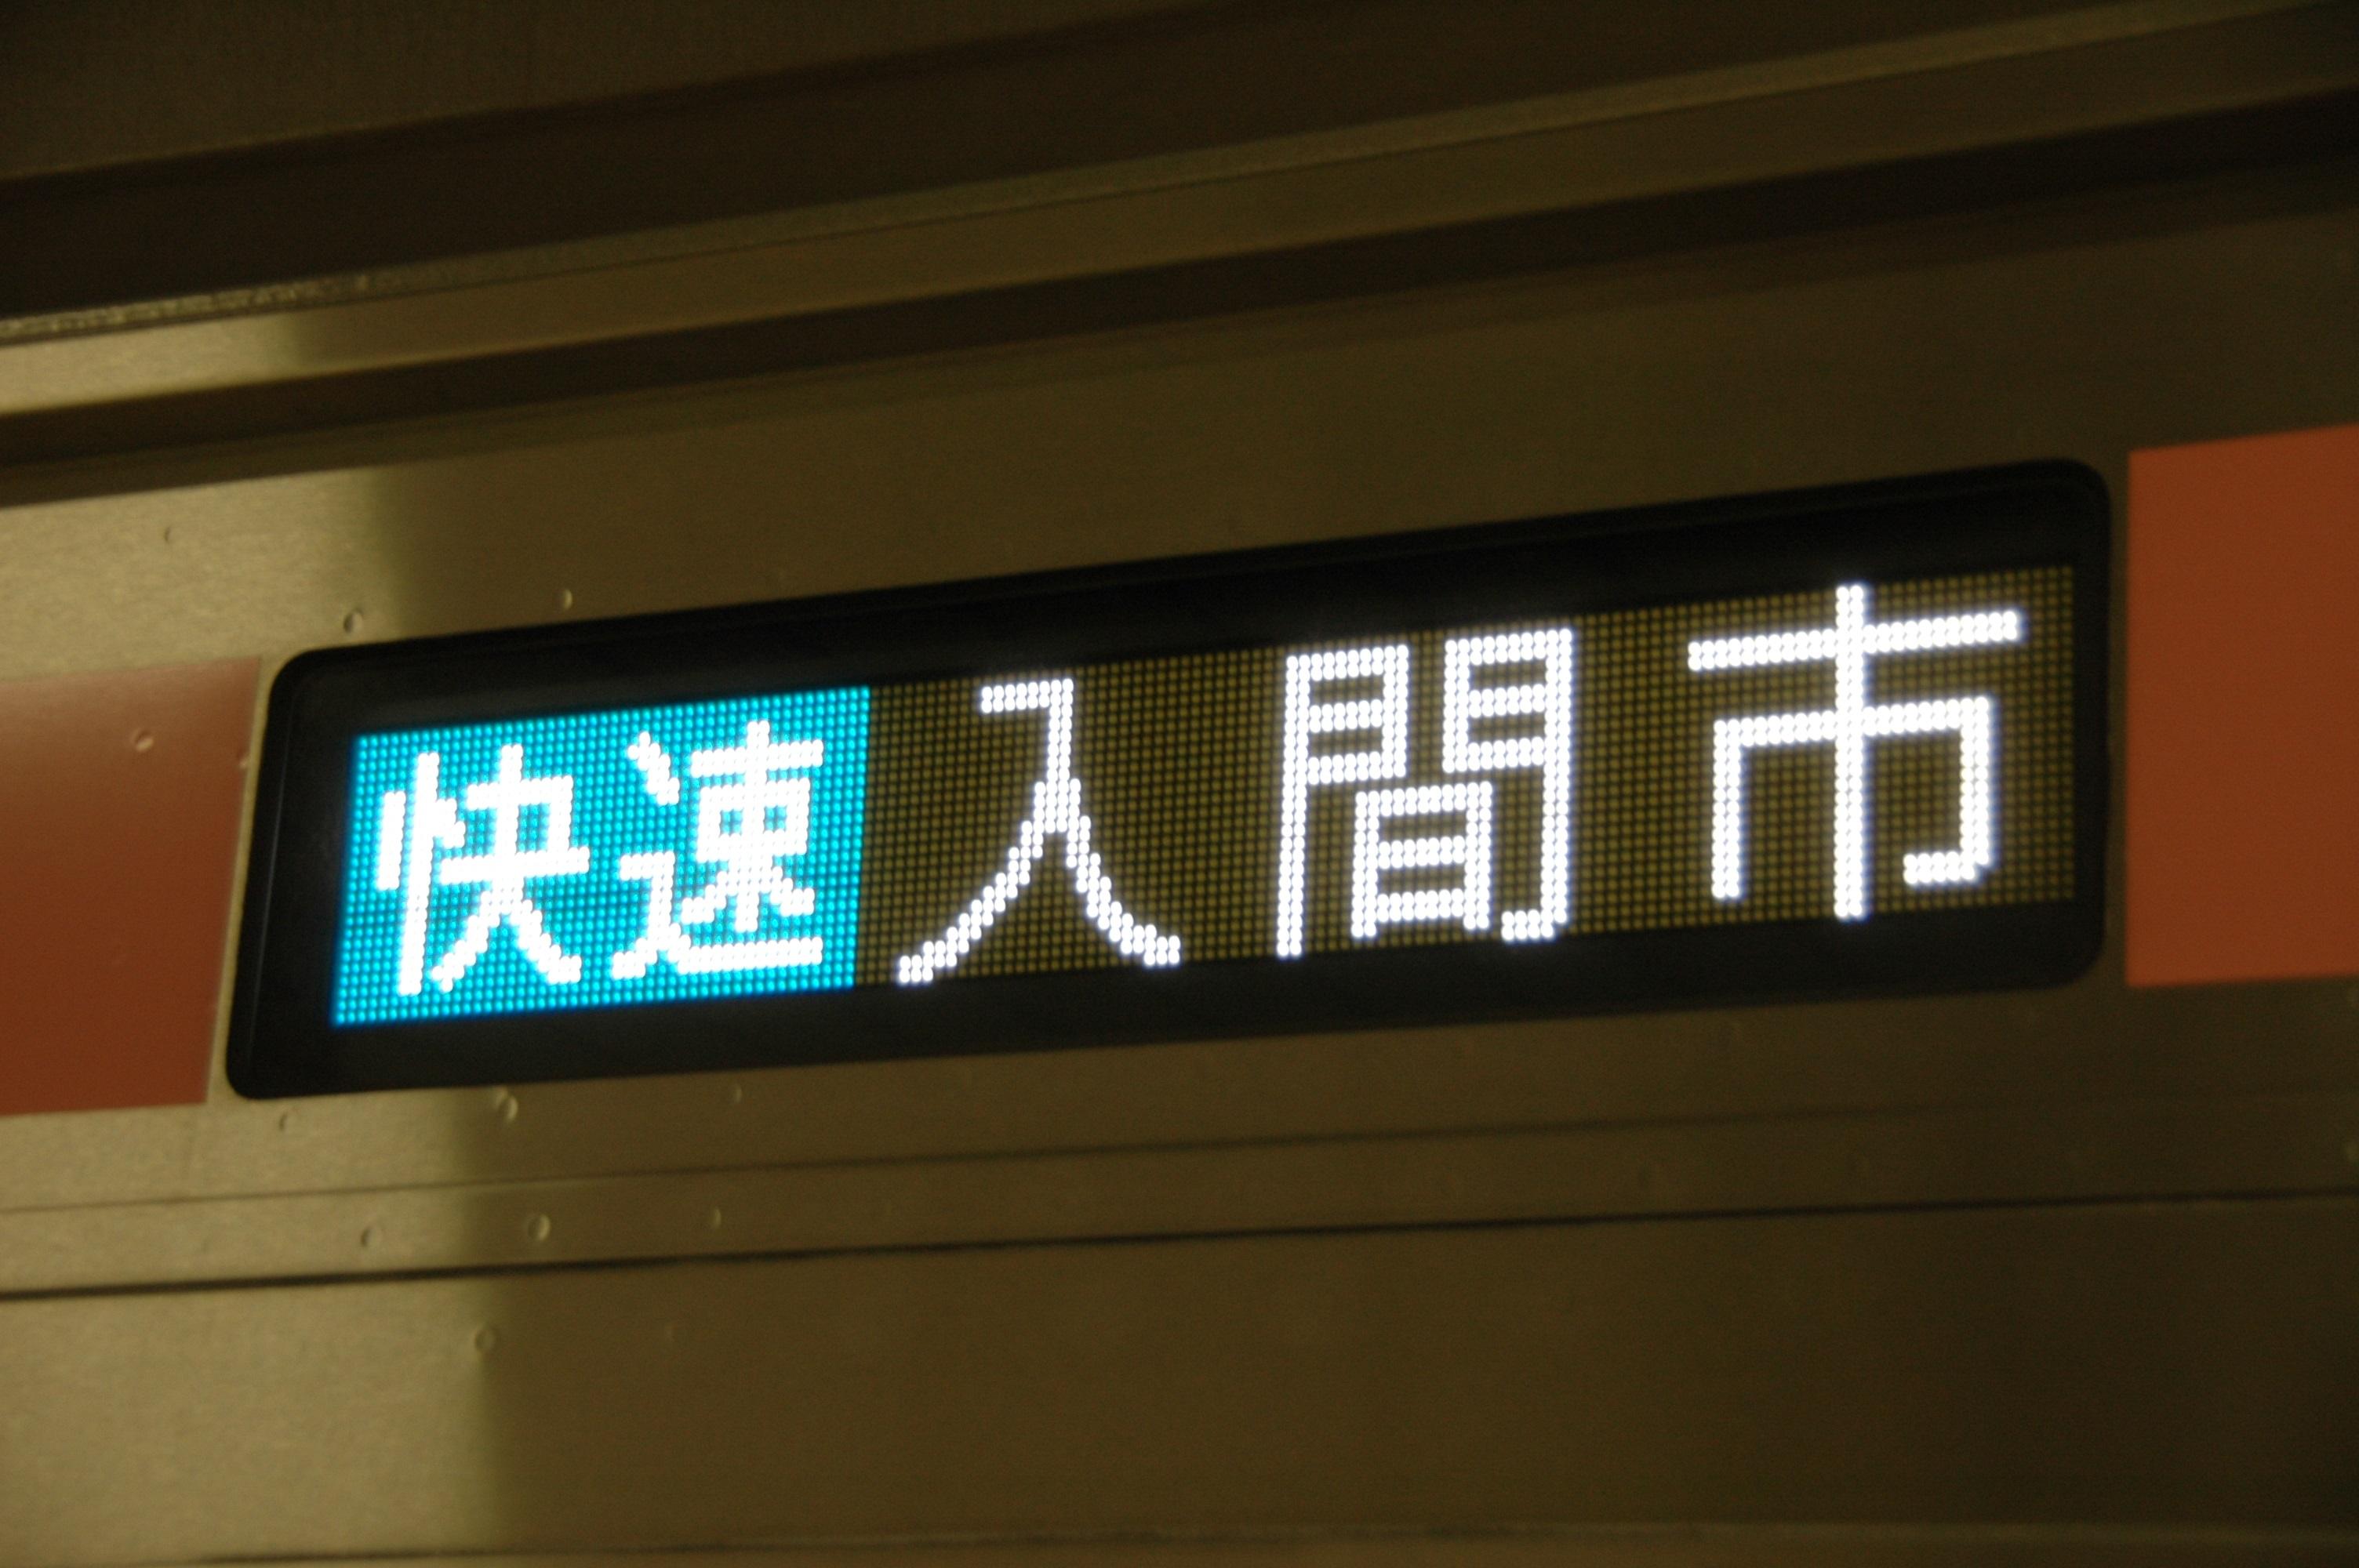 irumas_4.jpg